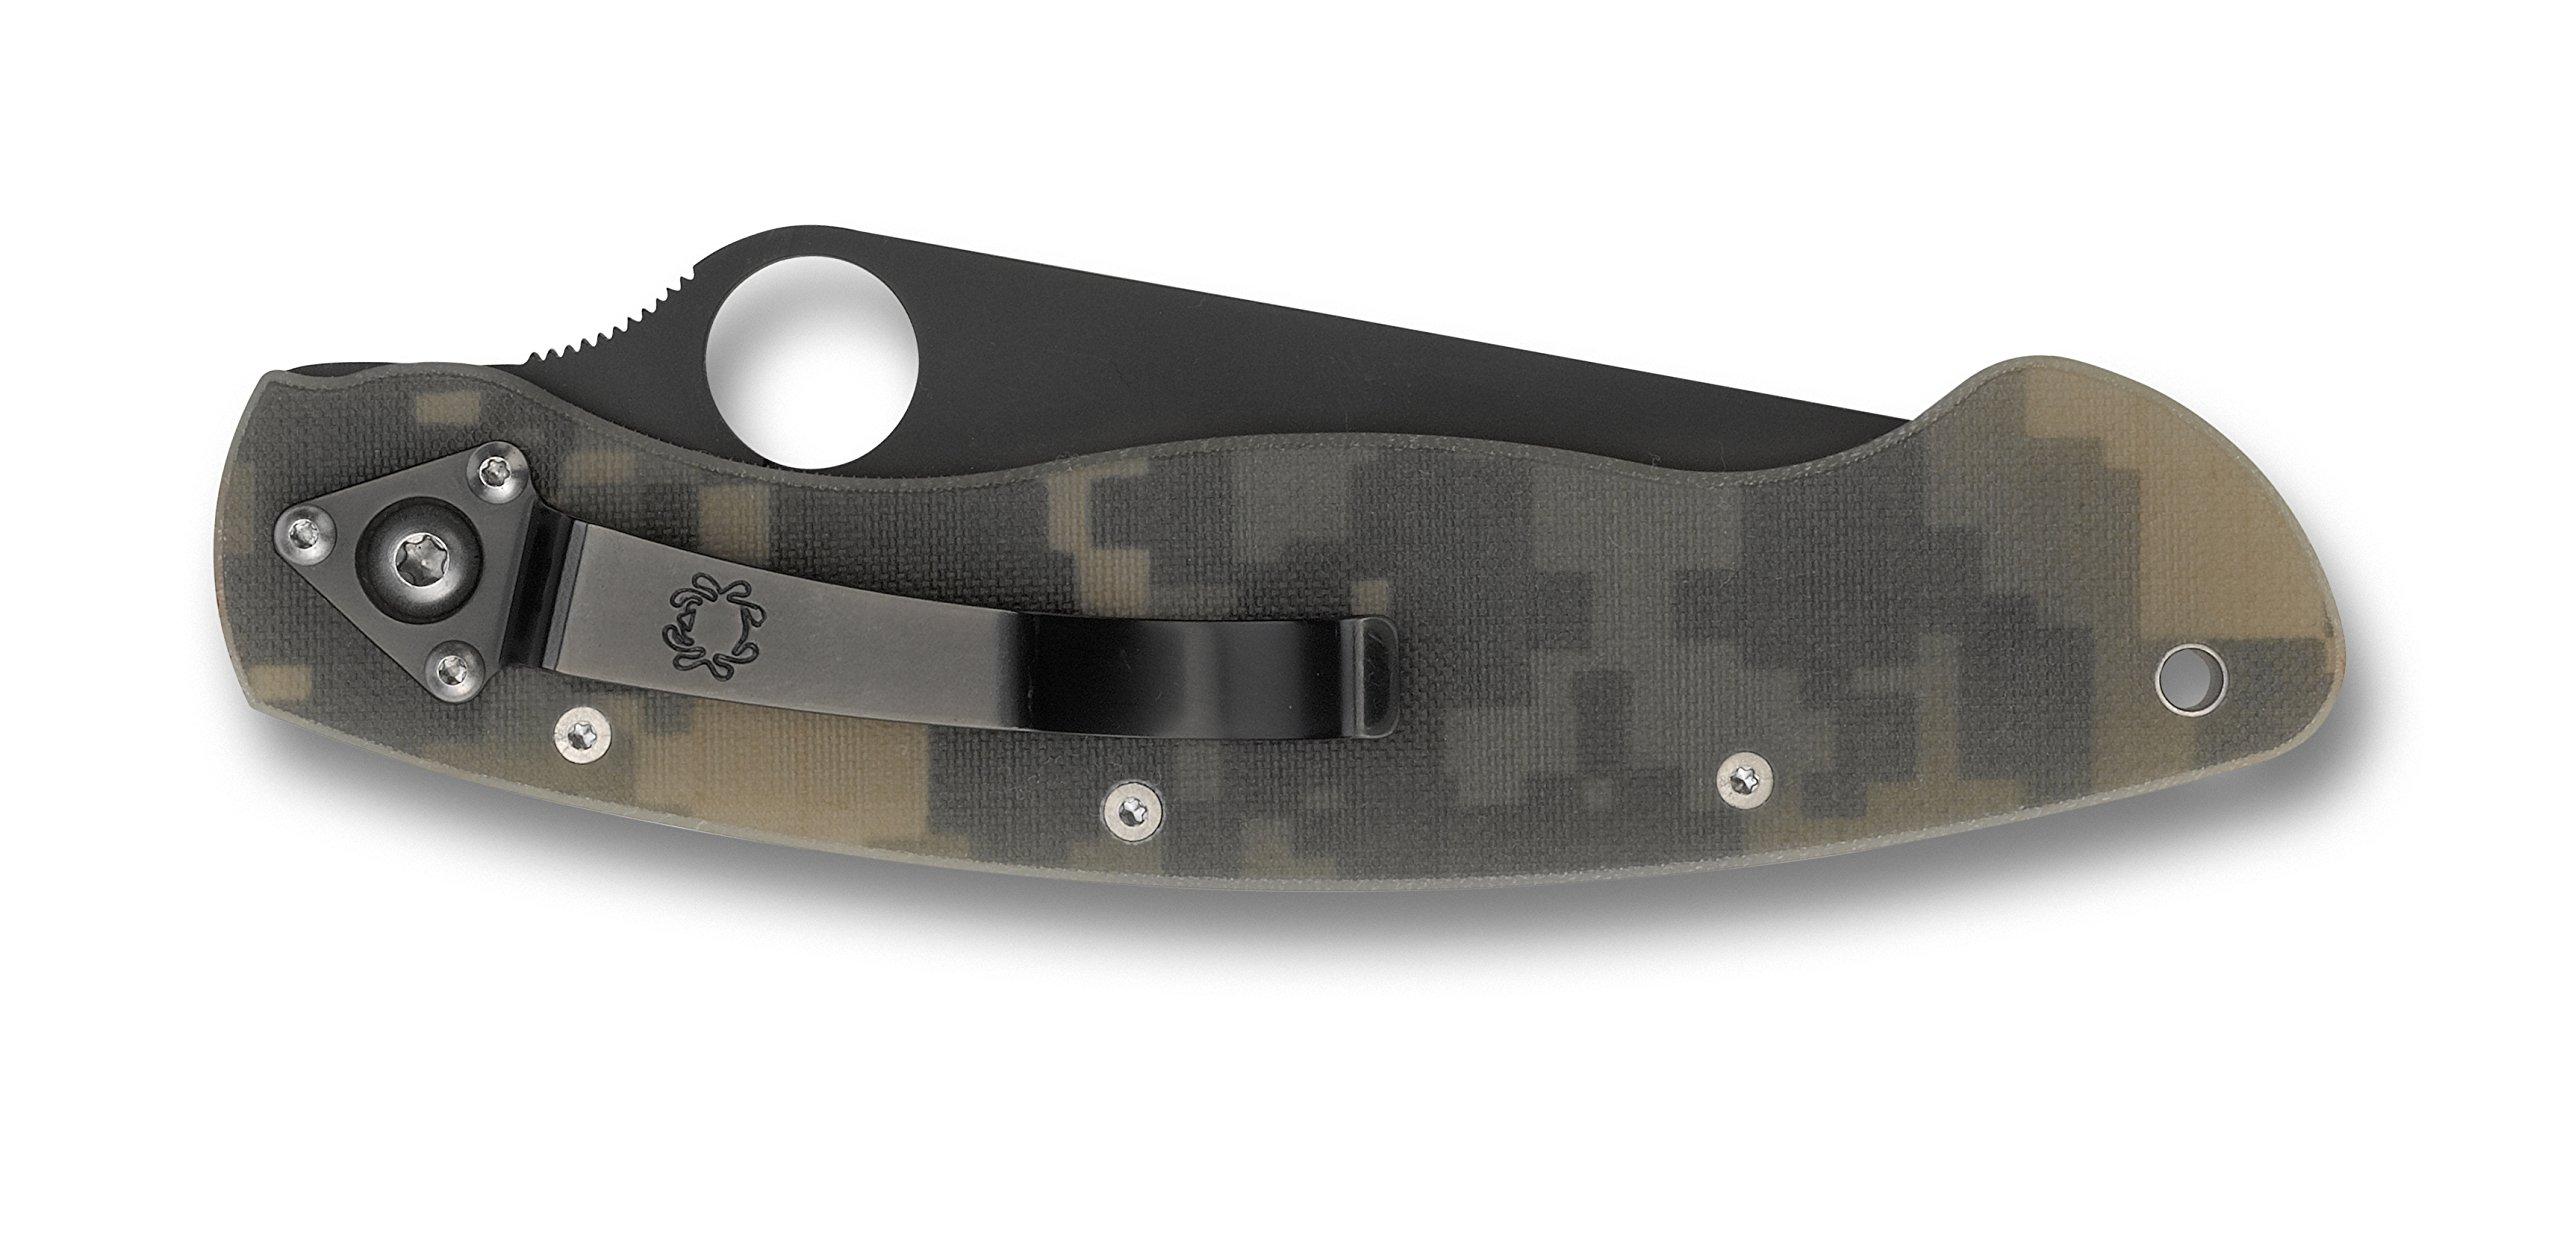 Spyderco (C36GP) Military Model G-10 Black Blade Plain Edge Knife, Camo by Spyderco (Image #1)